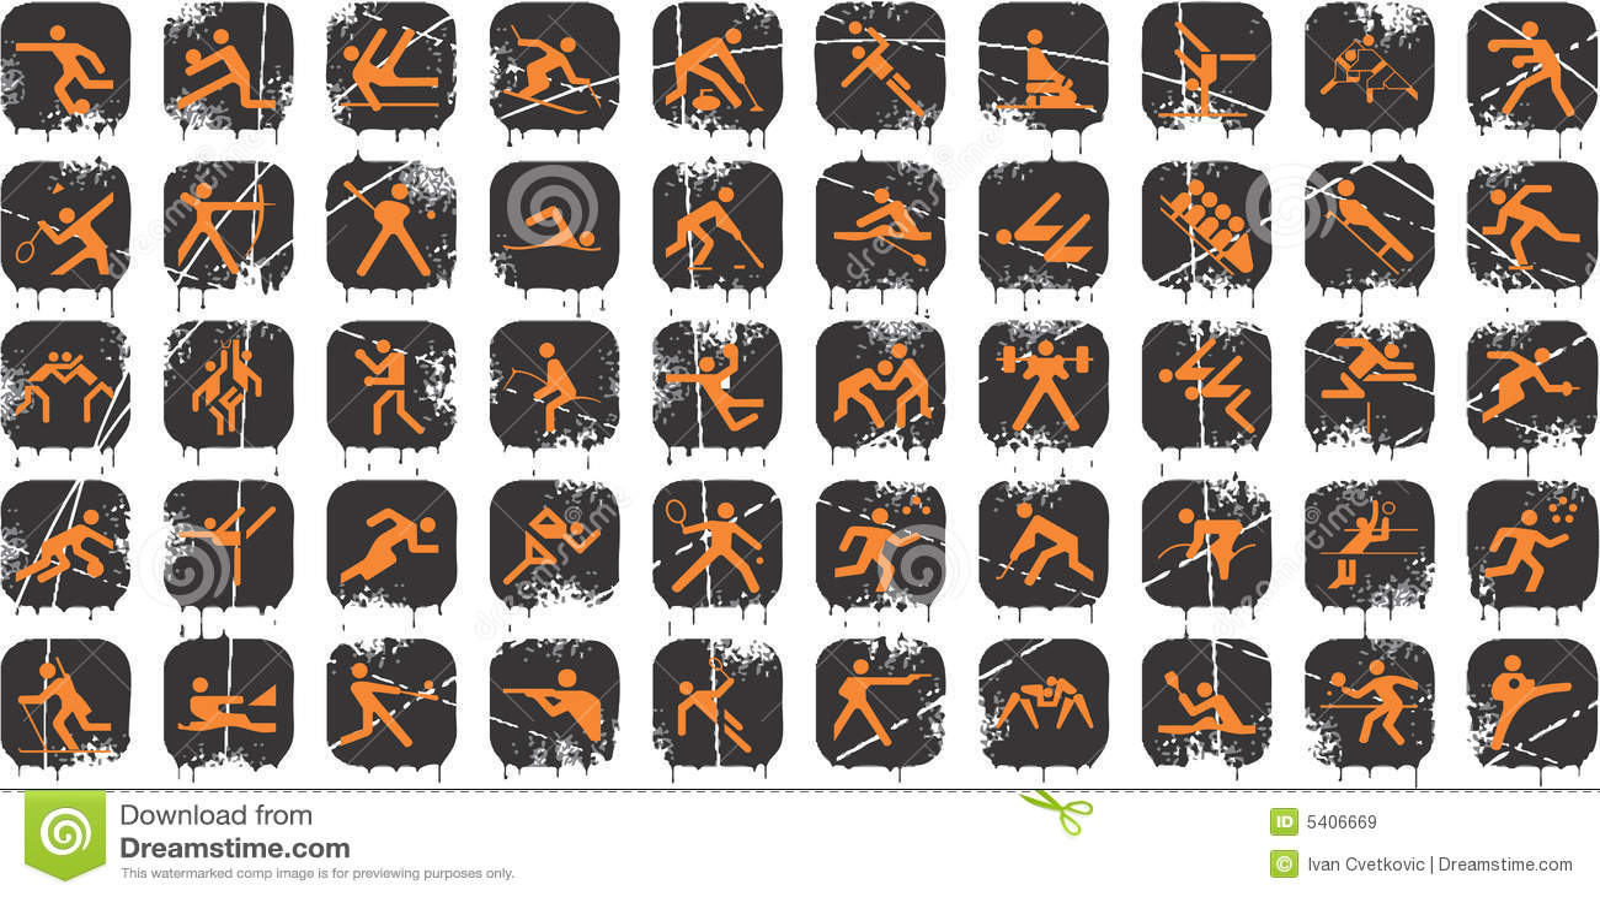 Grunge Sport Icons